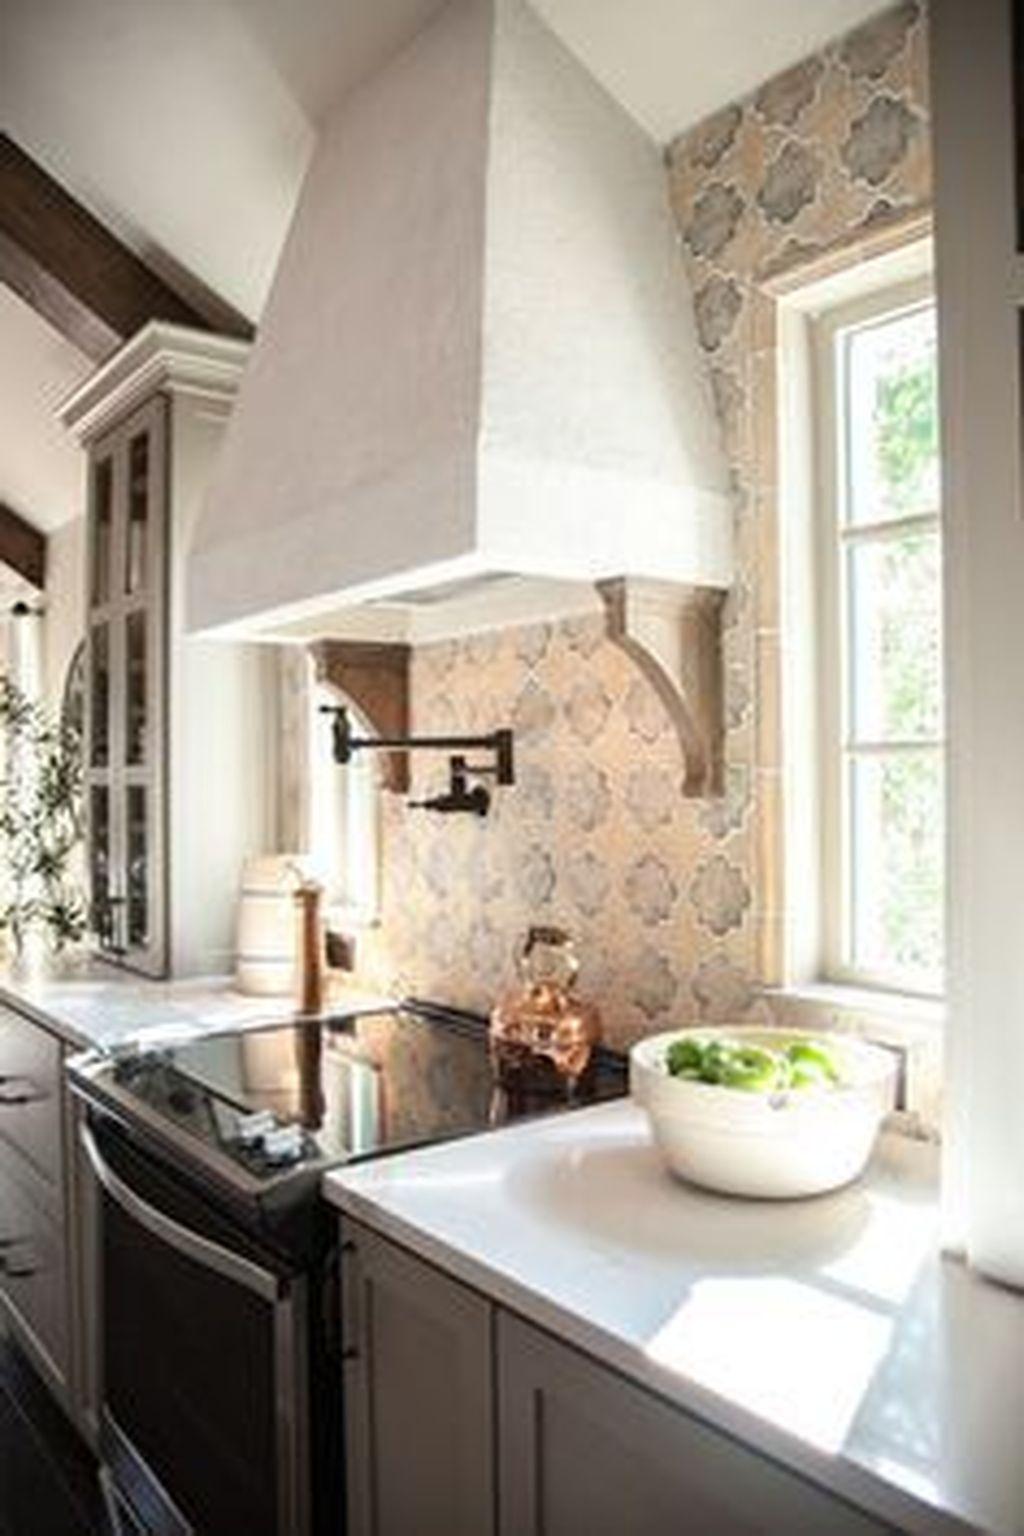 Fabulous Rustic Italian Decor Ideas For Your Home 31